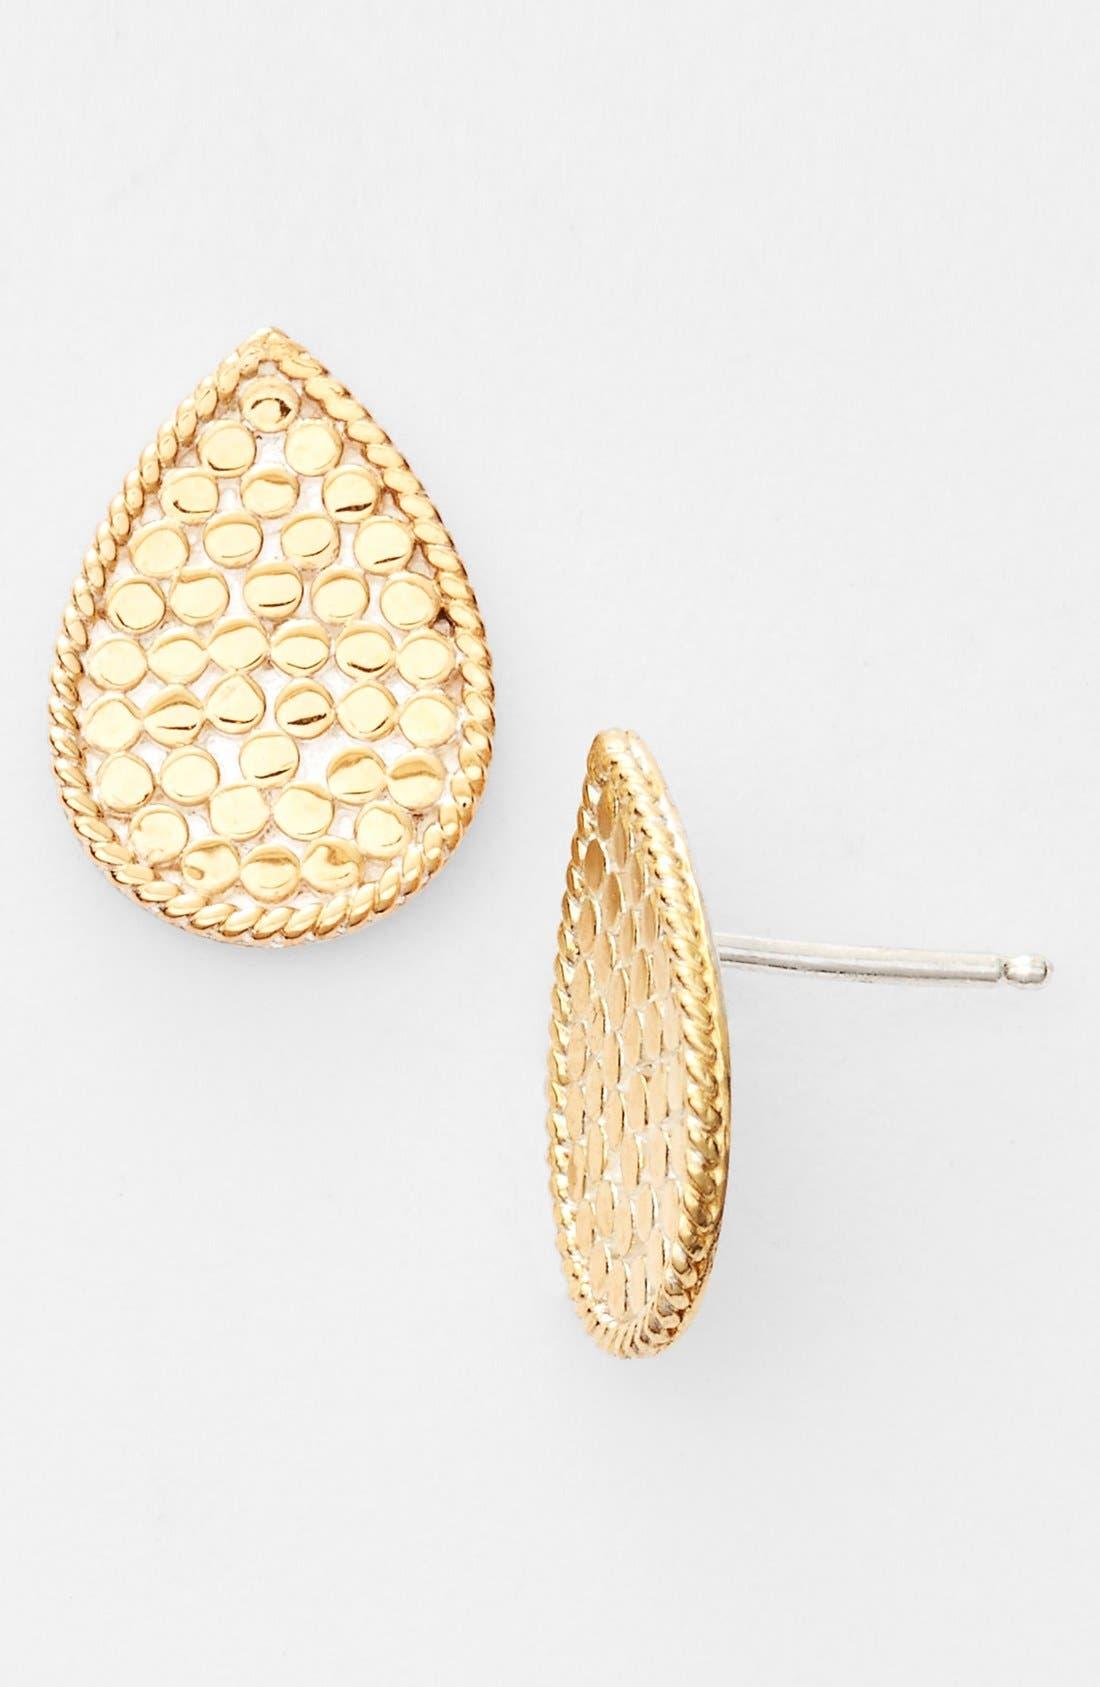 Alternate Image 1 Selected - Anna Beck 'Gili' Boxed Stud Earrings